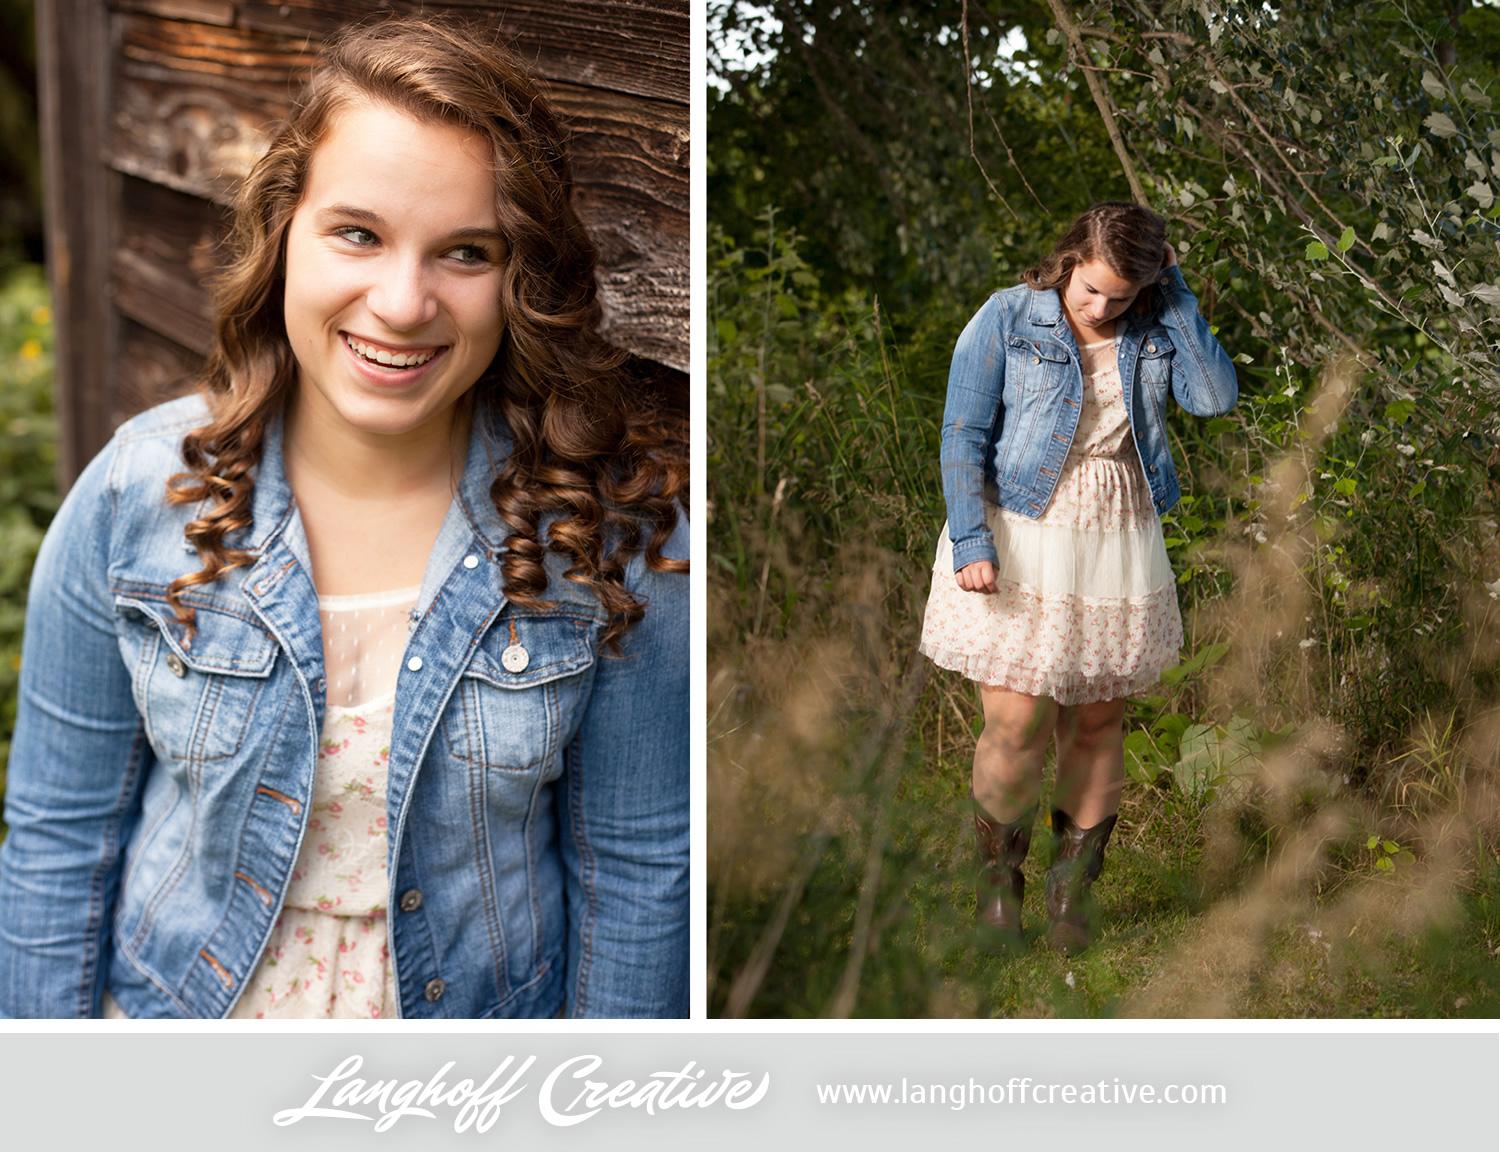 RacineSeniorPortraits-senior2014-LanghoffCreative-BrittanyK-6-photo.jpg